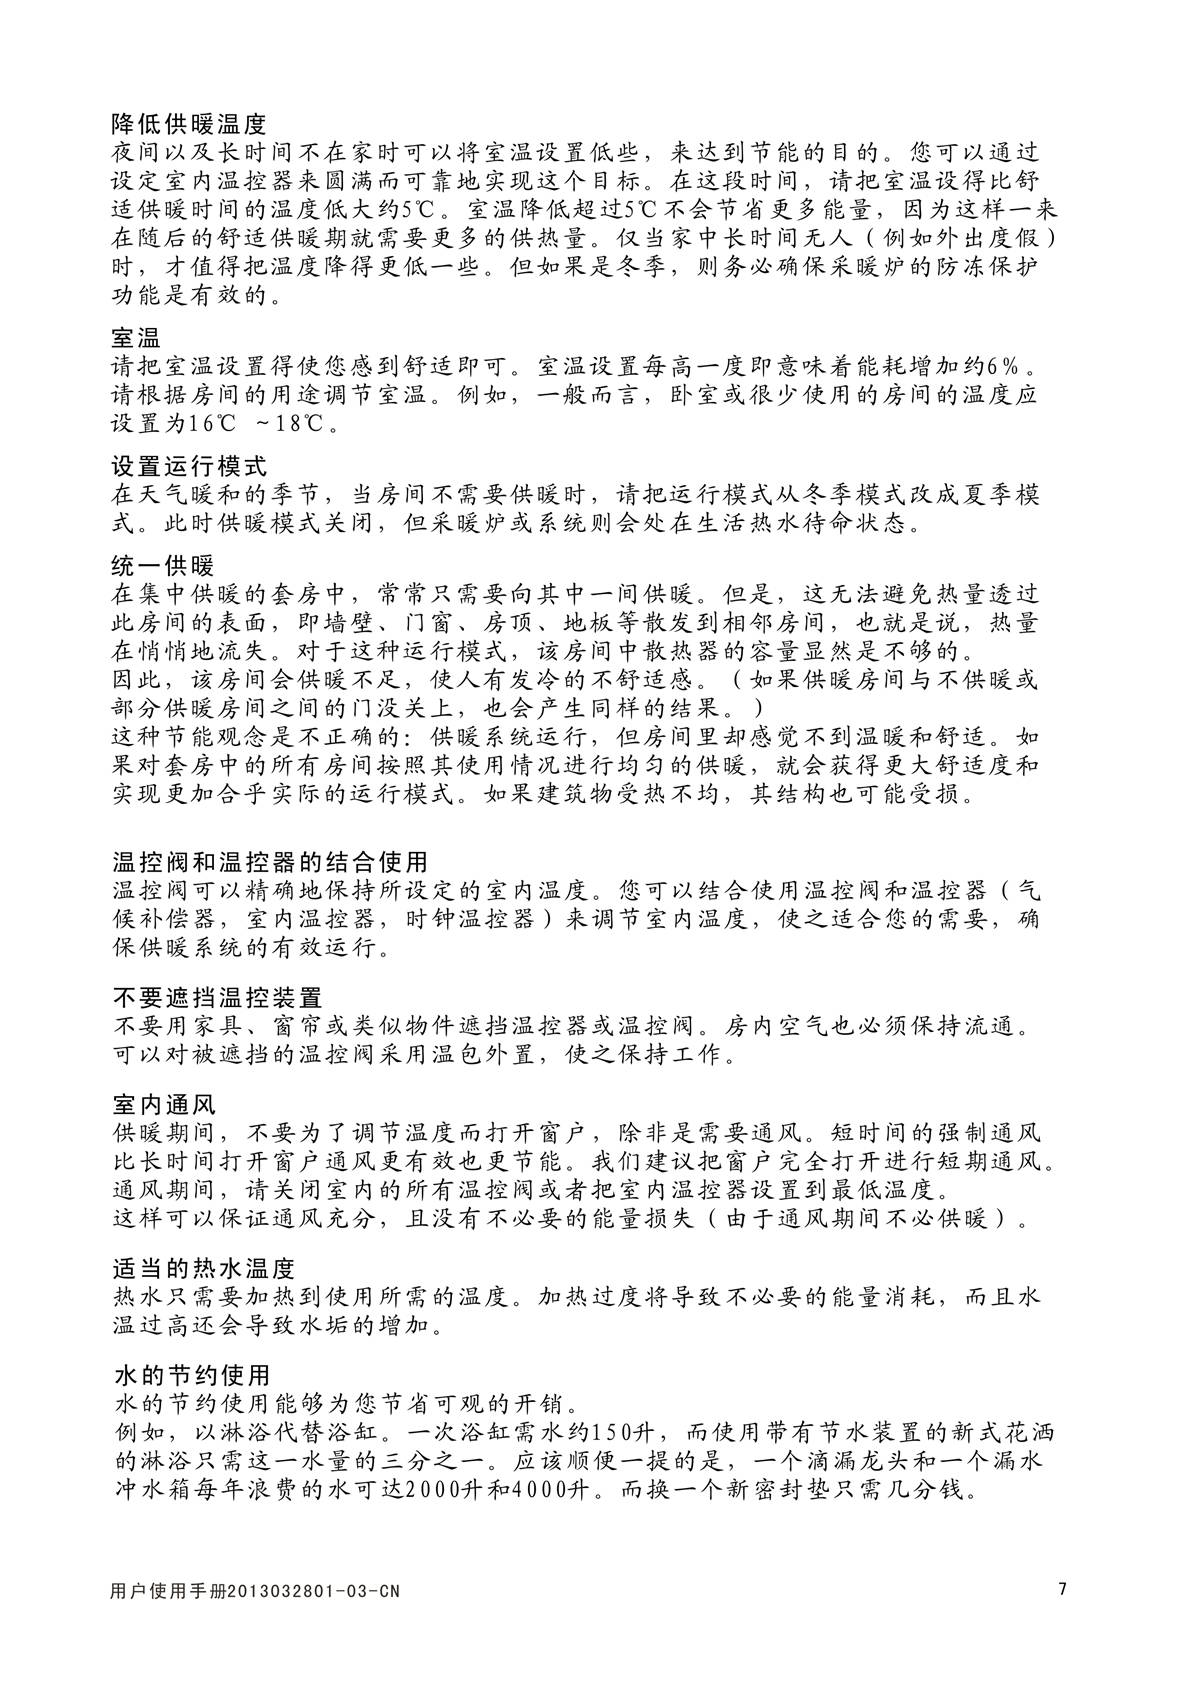 ES16A系列-用户使用手册-8_02.jpg